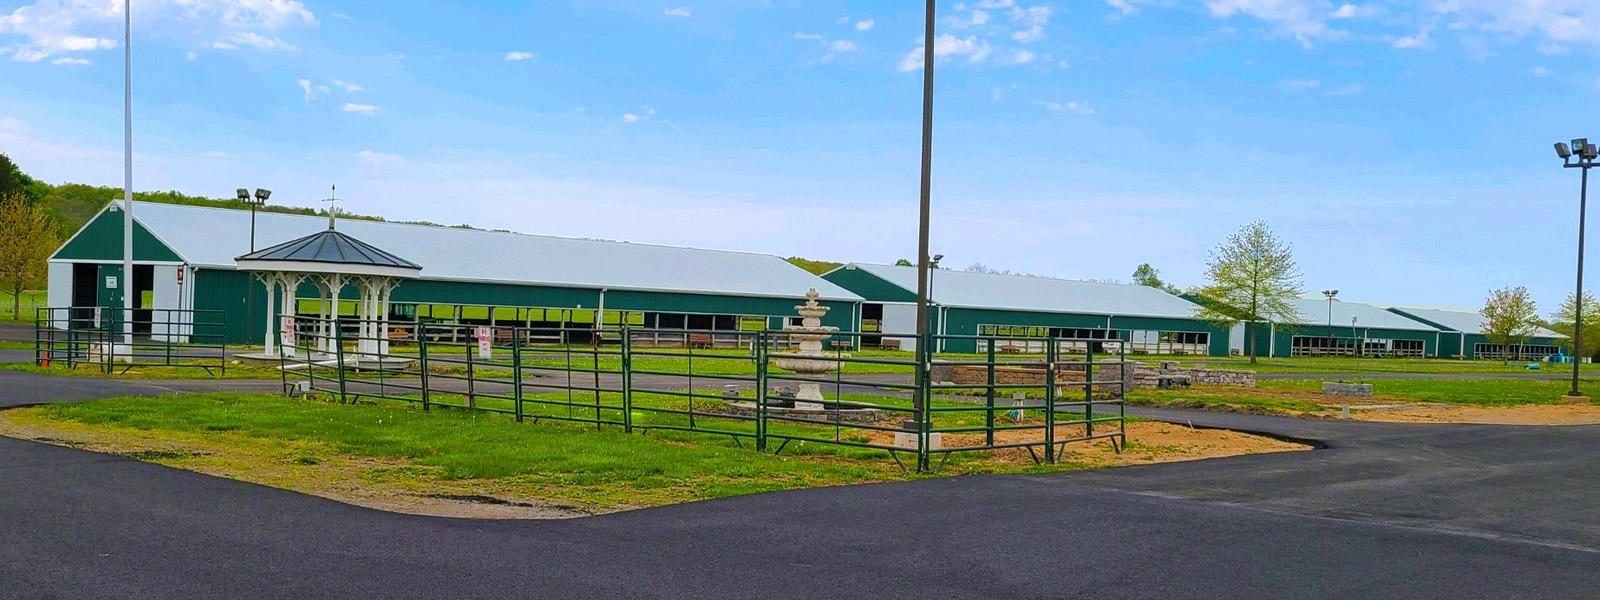 Hunterdon County Fairgrounds